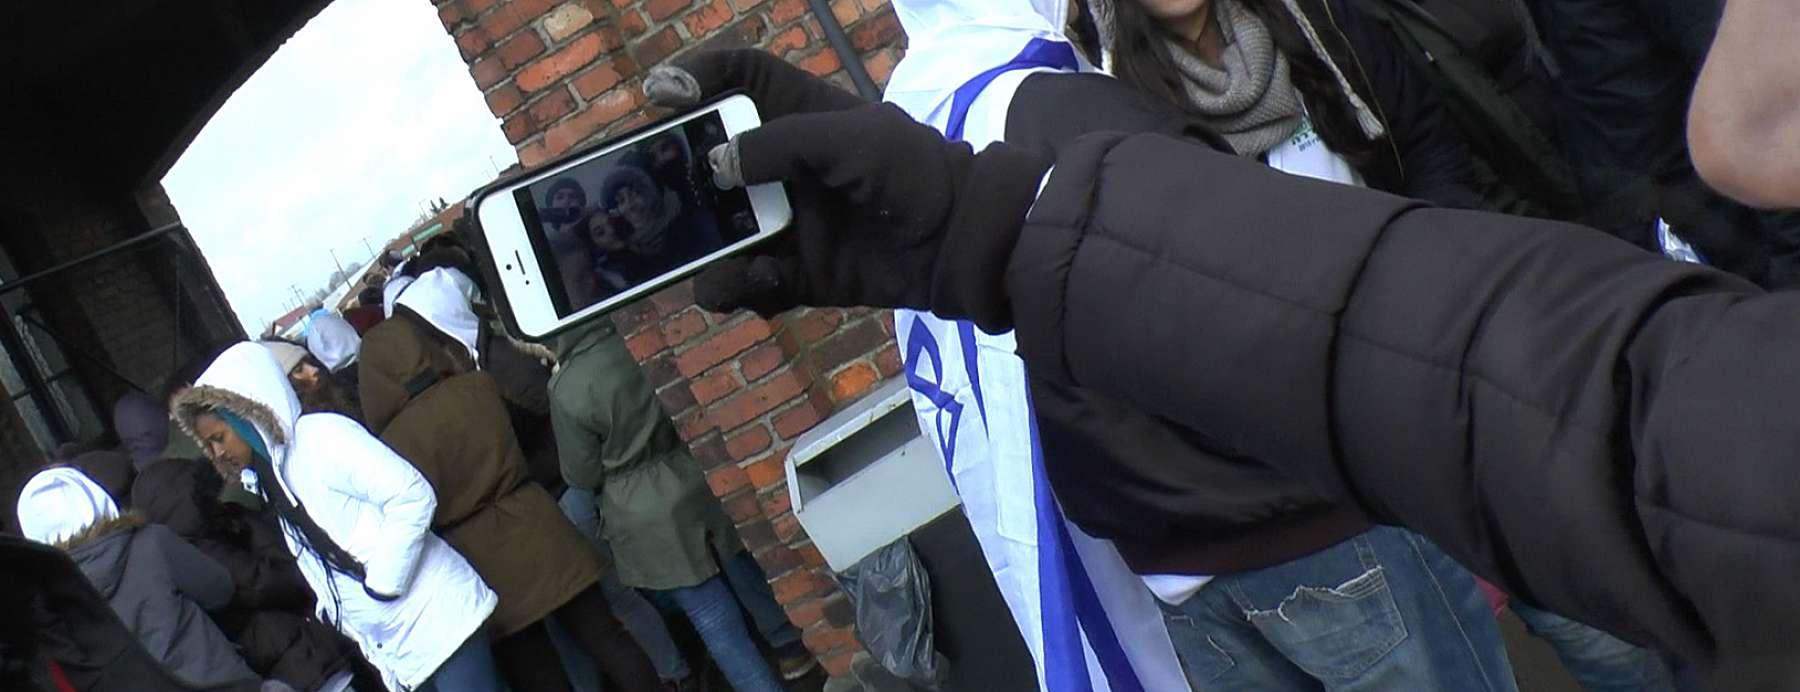 Uploading Holocaust